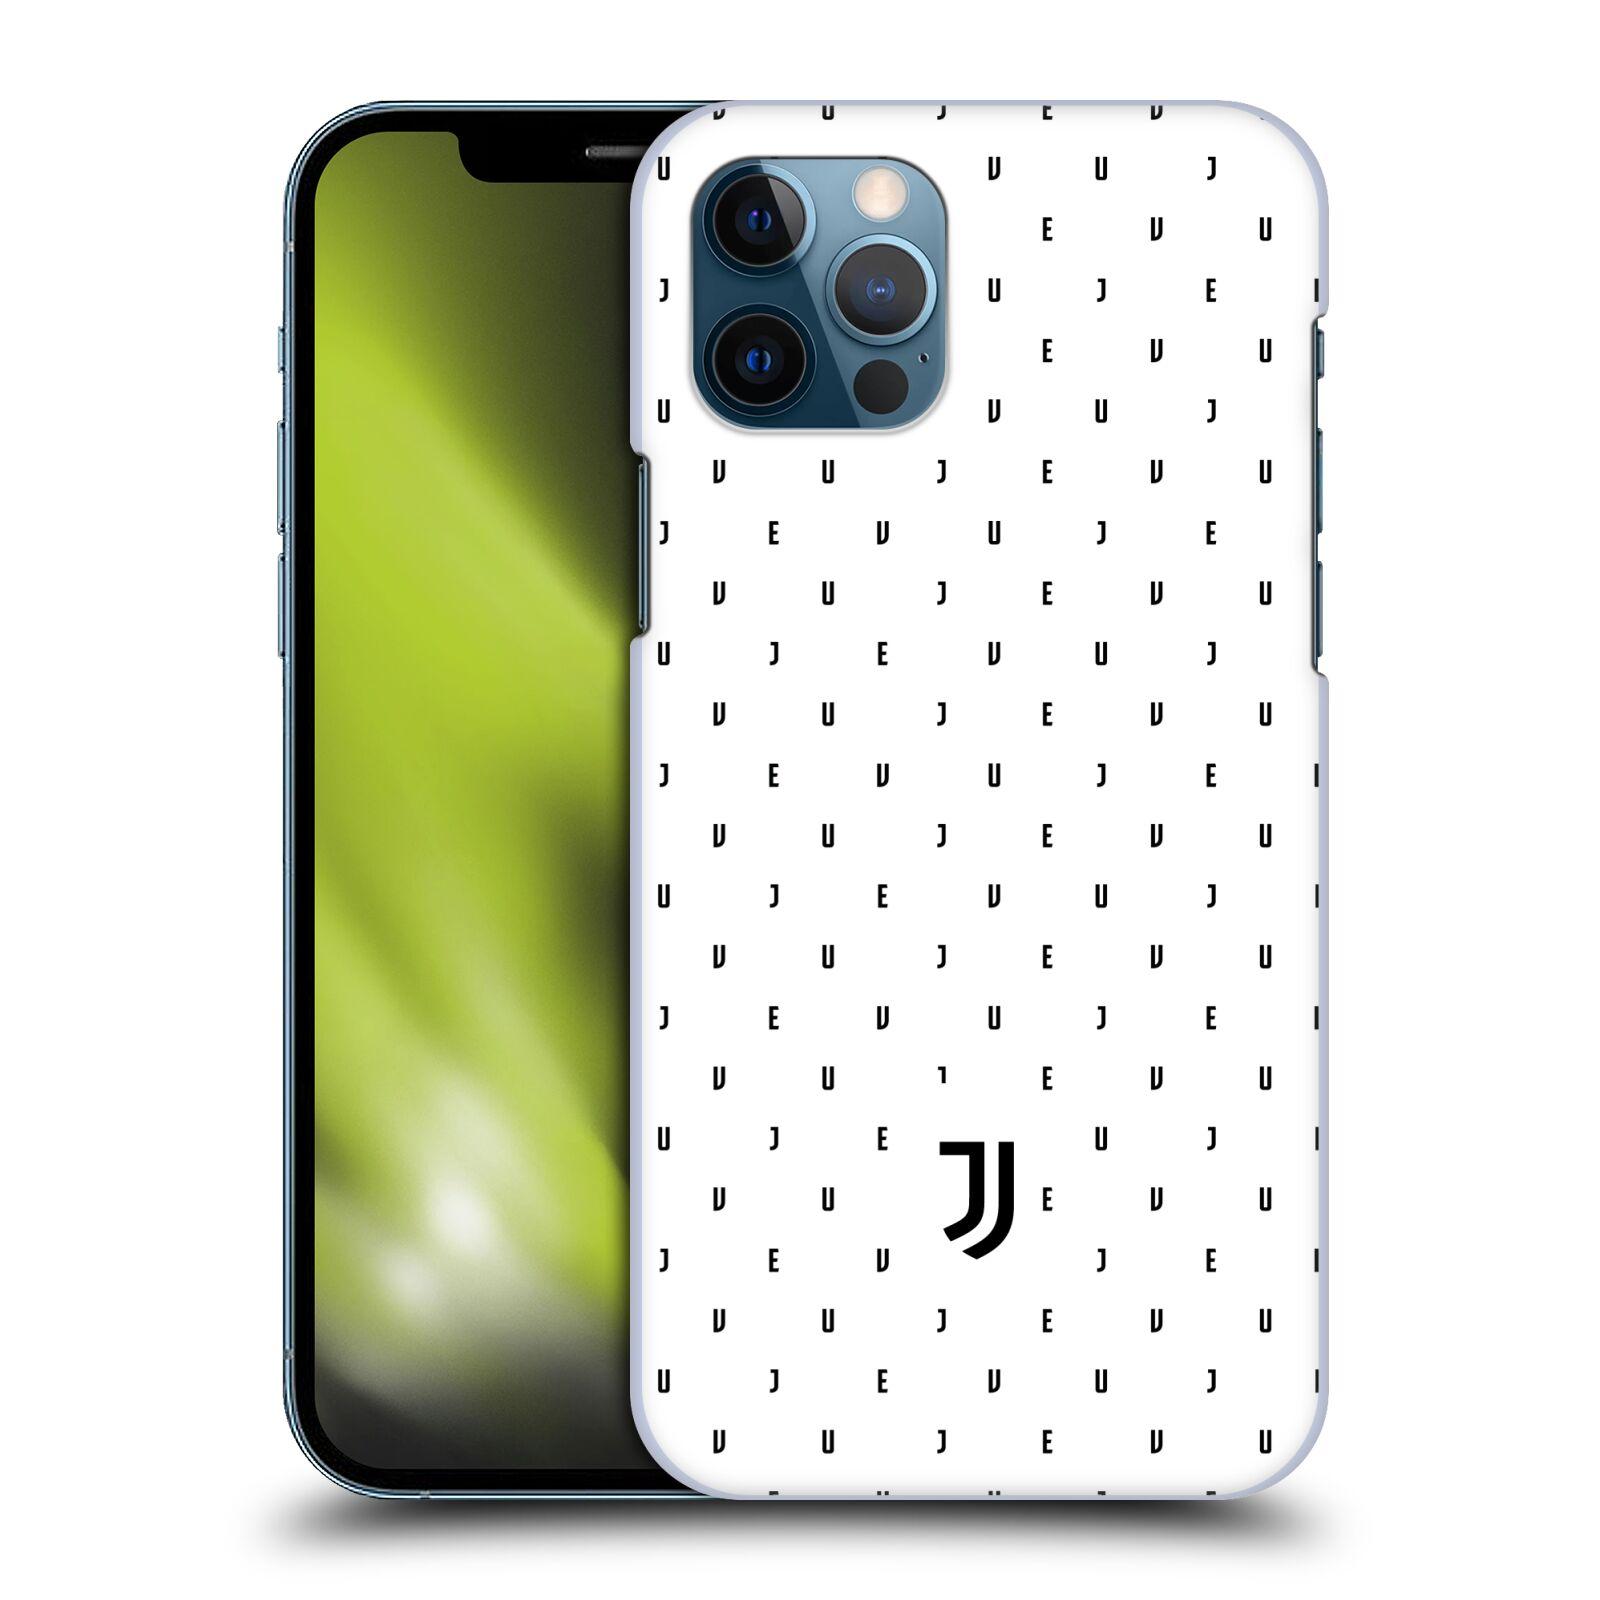 Plastové pouzdro na mobil Apple iPhone 12 / 12 Pro - Head Case - Juventus FC - Nové logo - Decentní